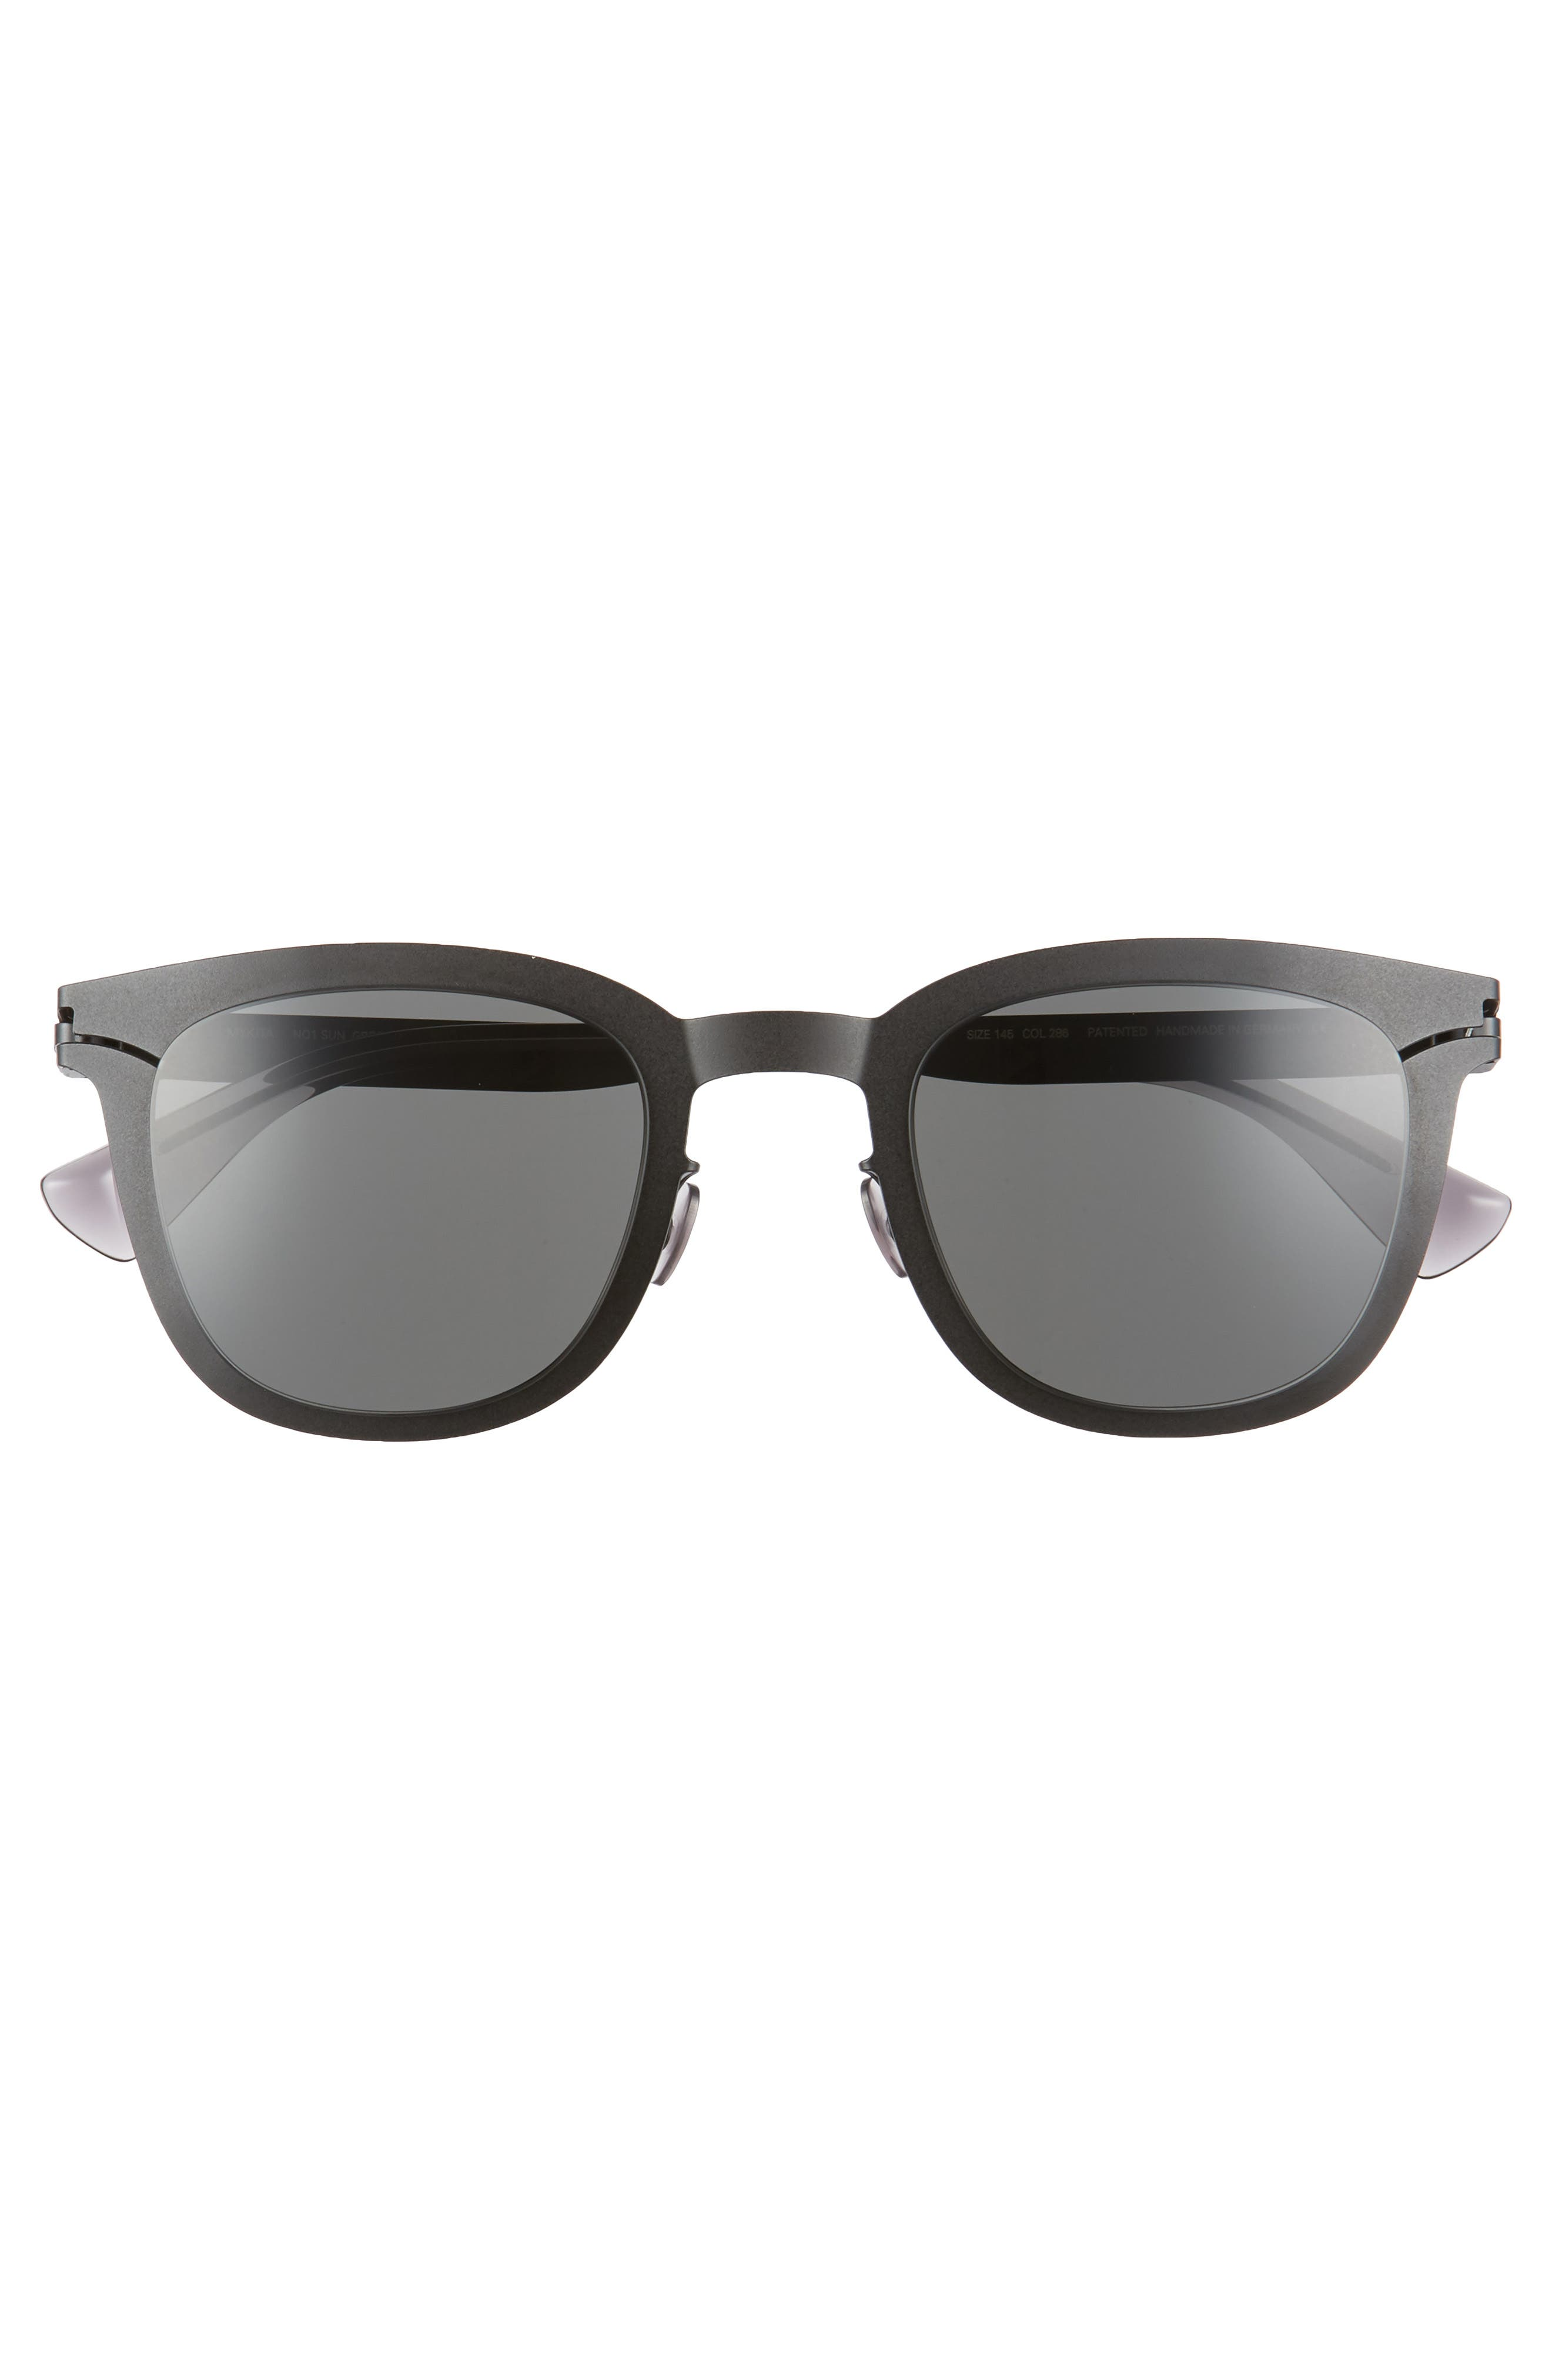 Gregory 49mm Sunglasses,                             Alternate thumbnail 2, color,                             Matte Black